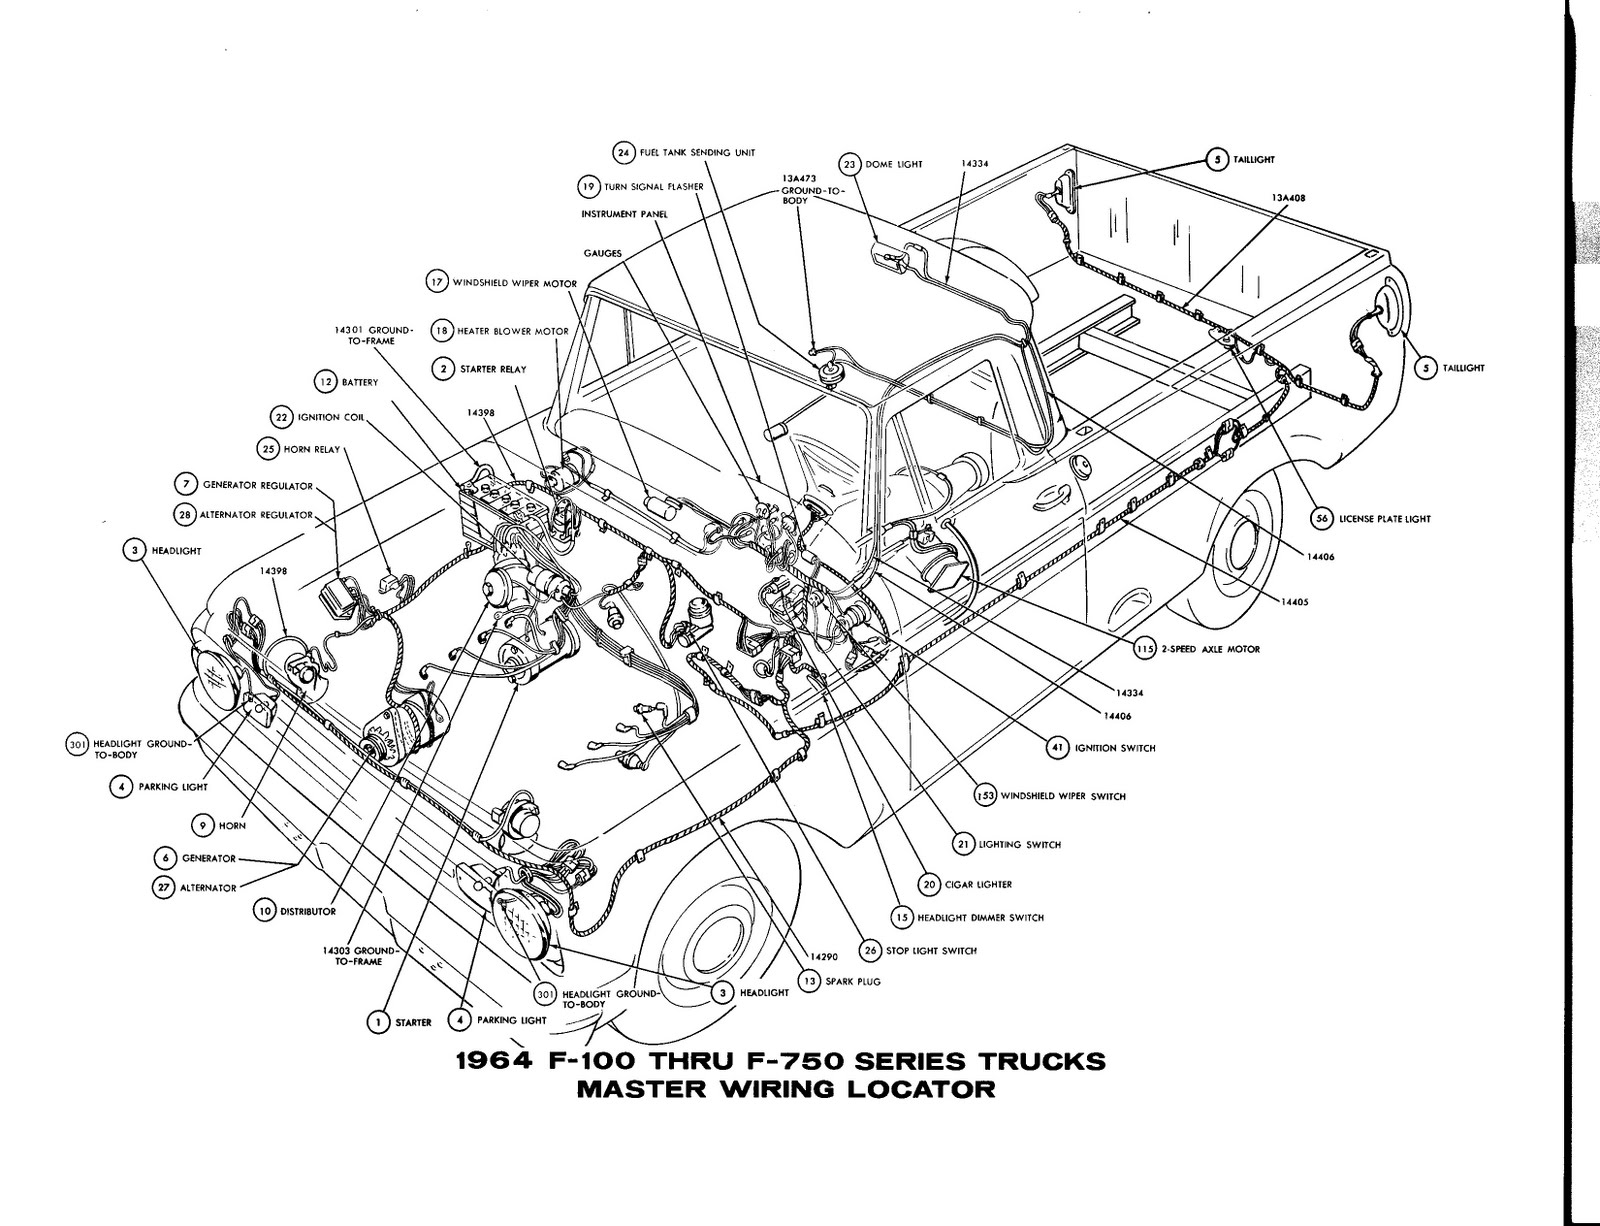 hight resolution of 1964 ford f 100 thru f 750 truck master wiring